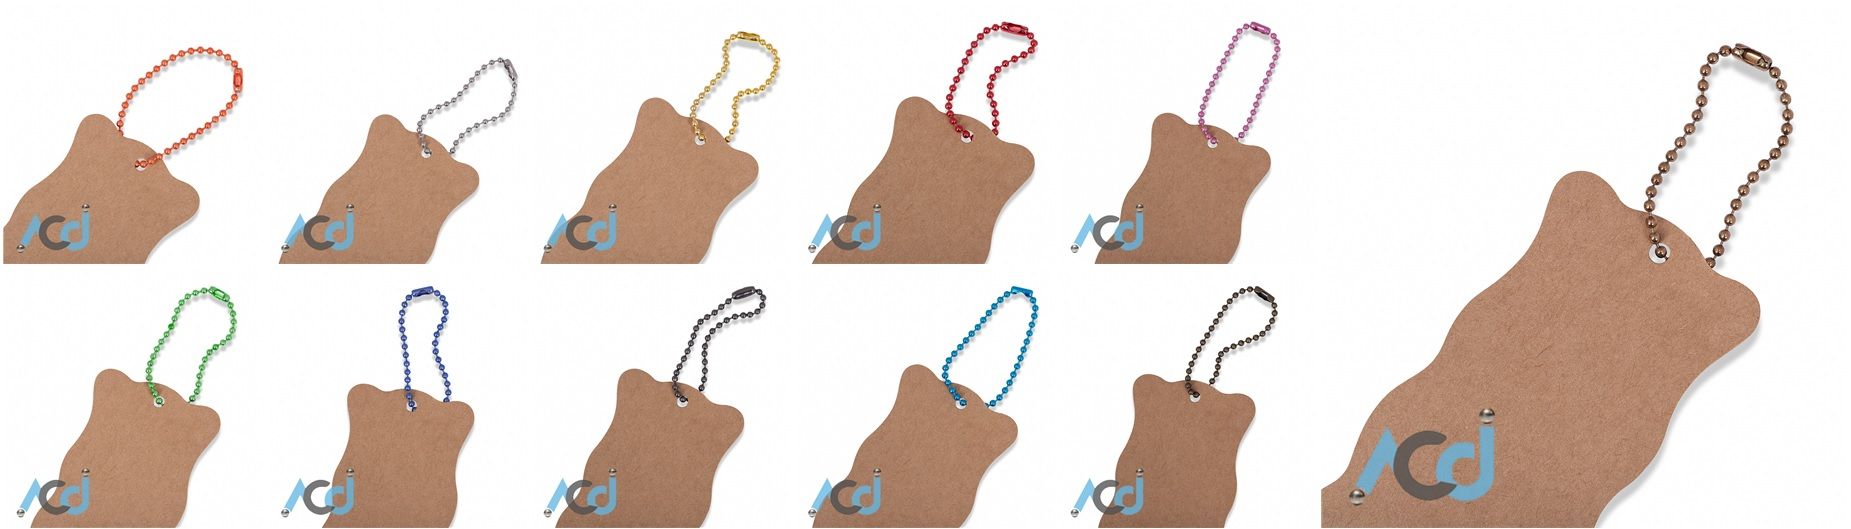 swing-tag-cat.jpg